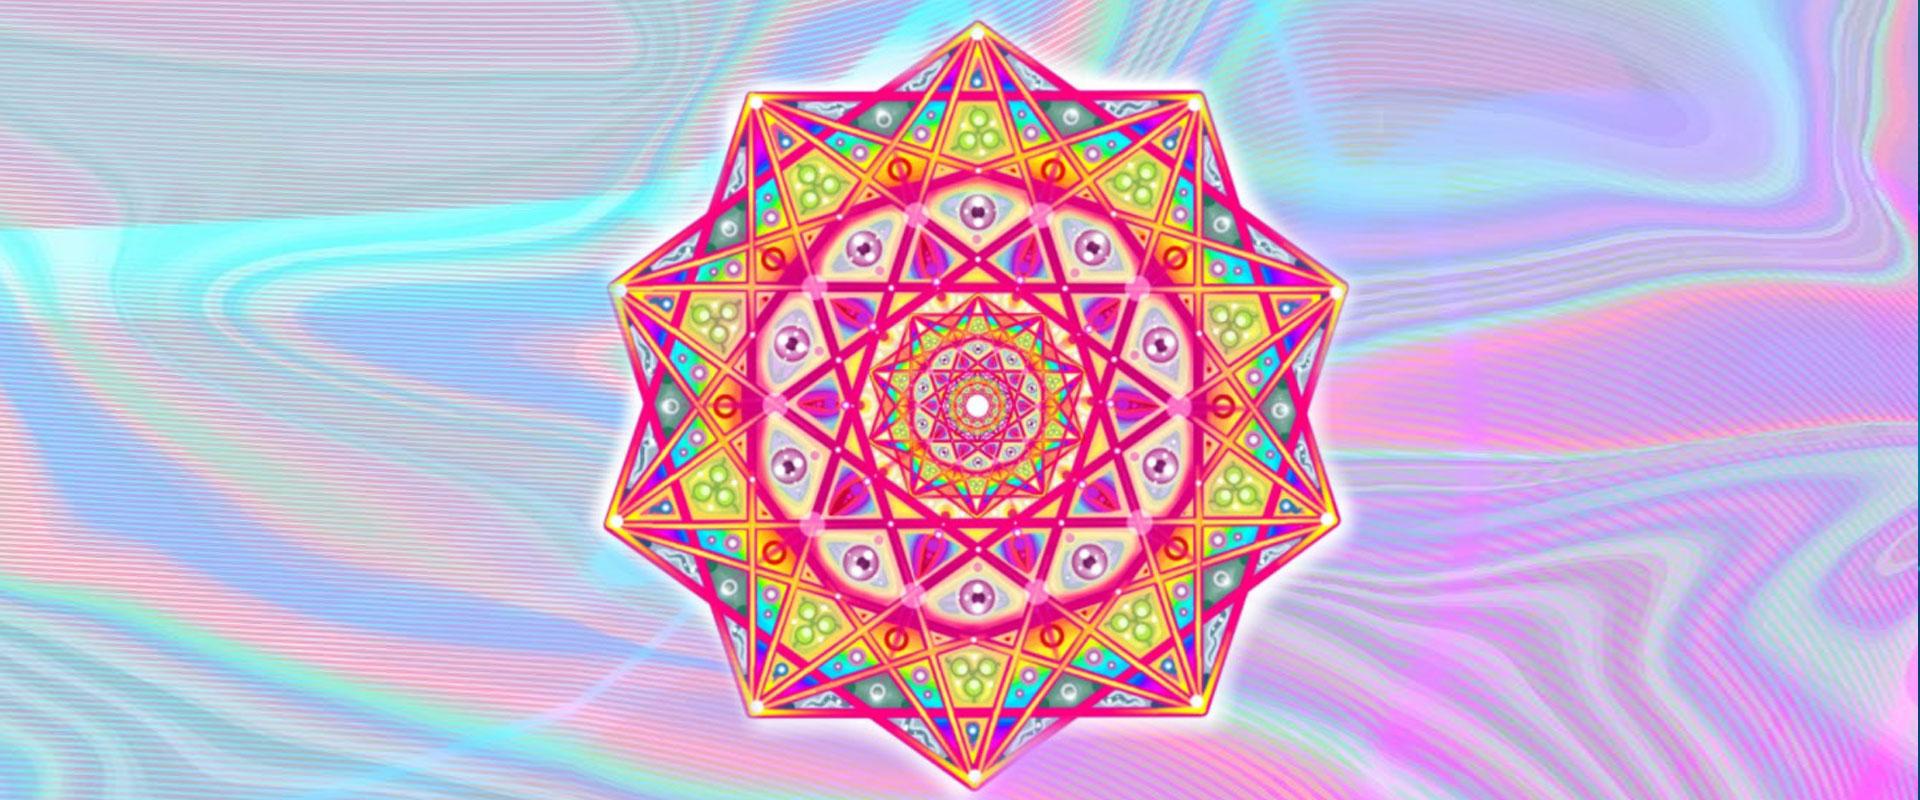 estrella-dodecaedro-2